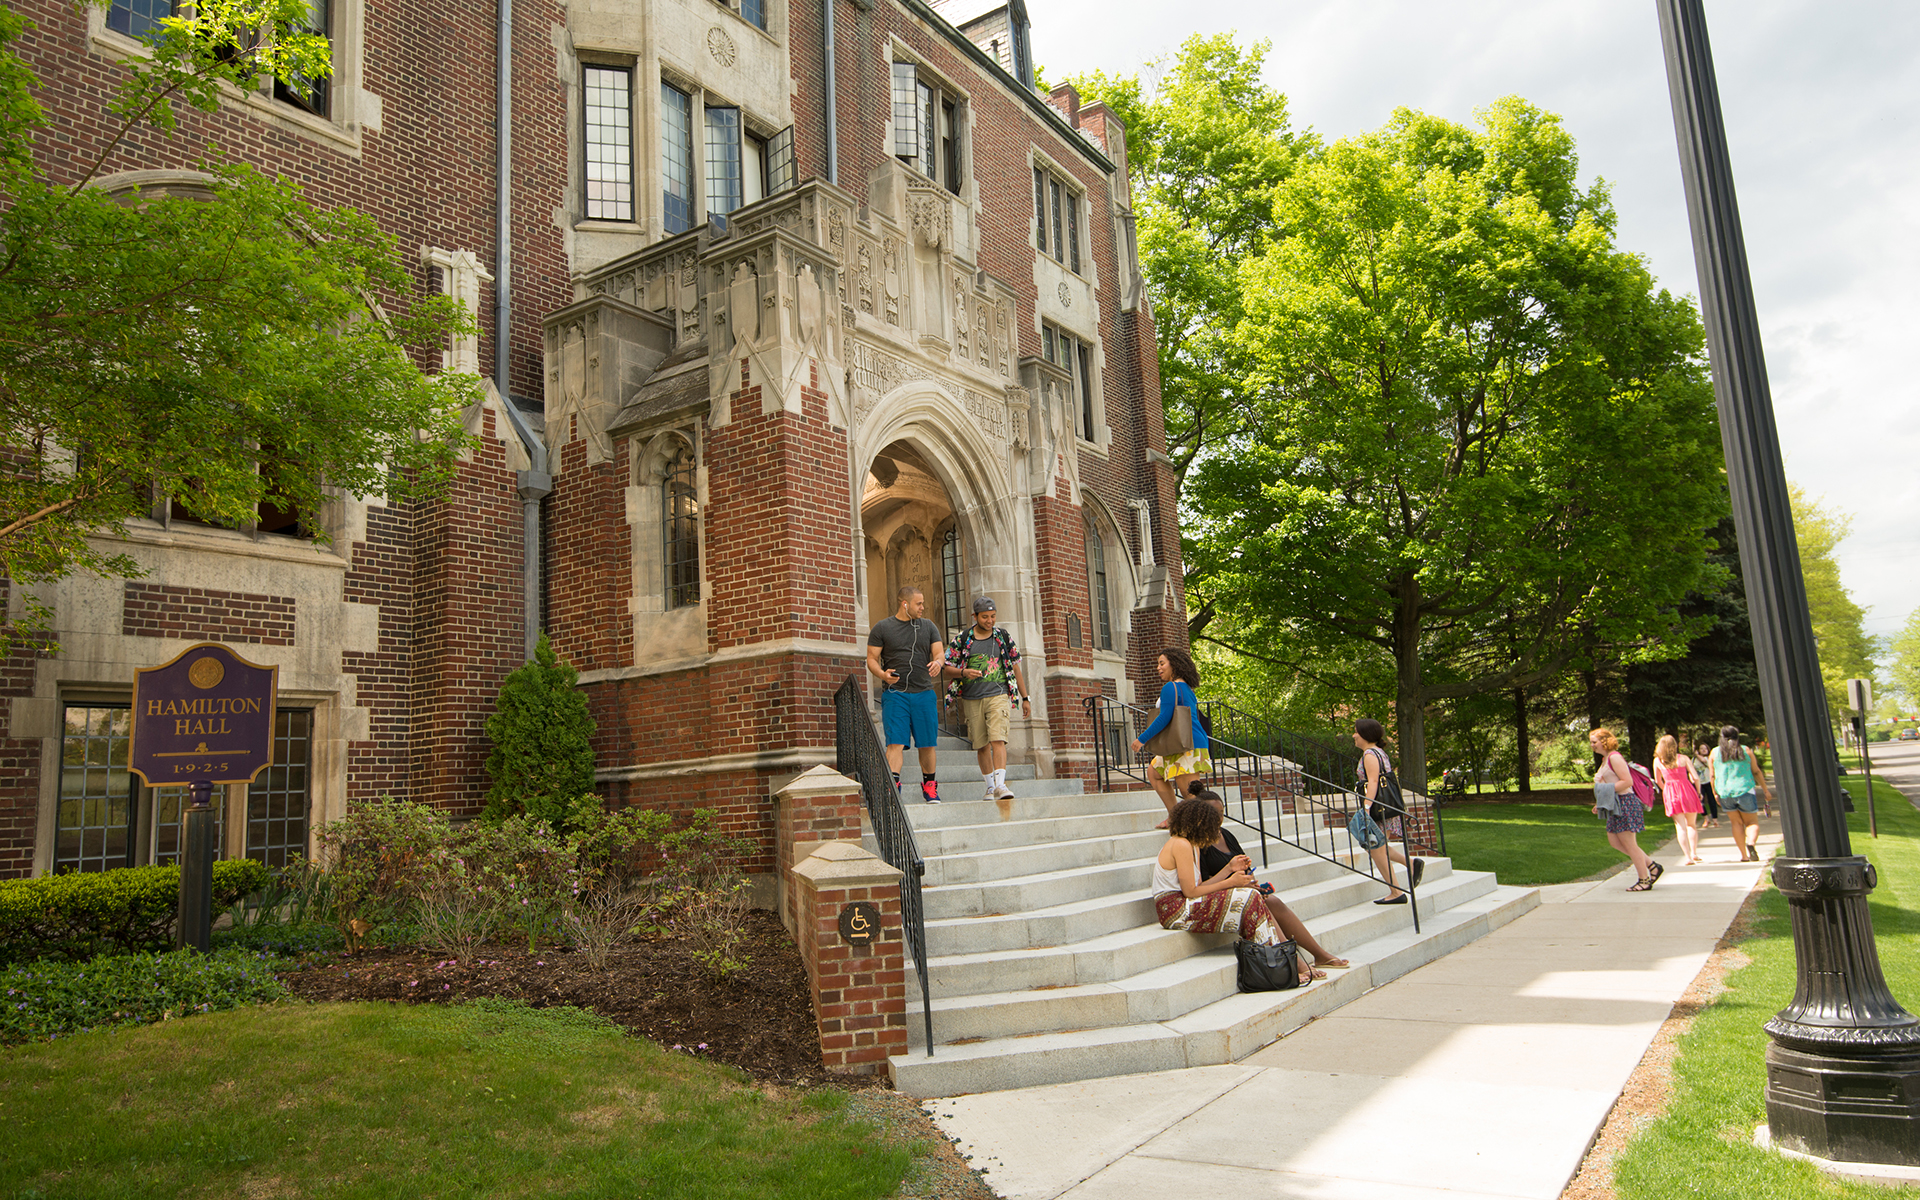 Elmira College's Hamilton Hall.